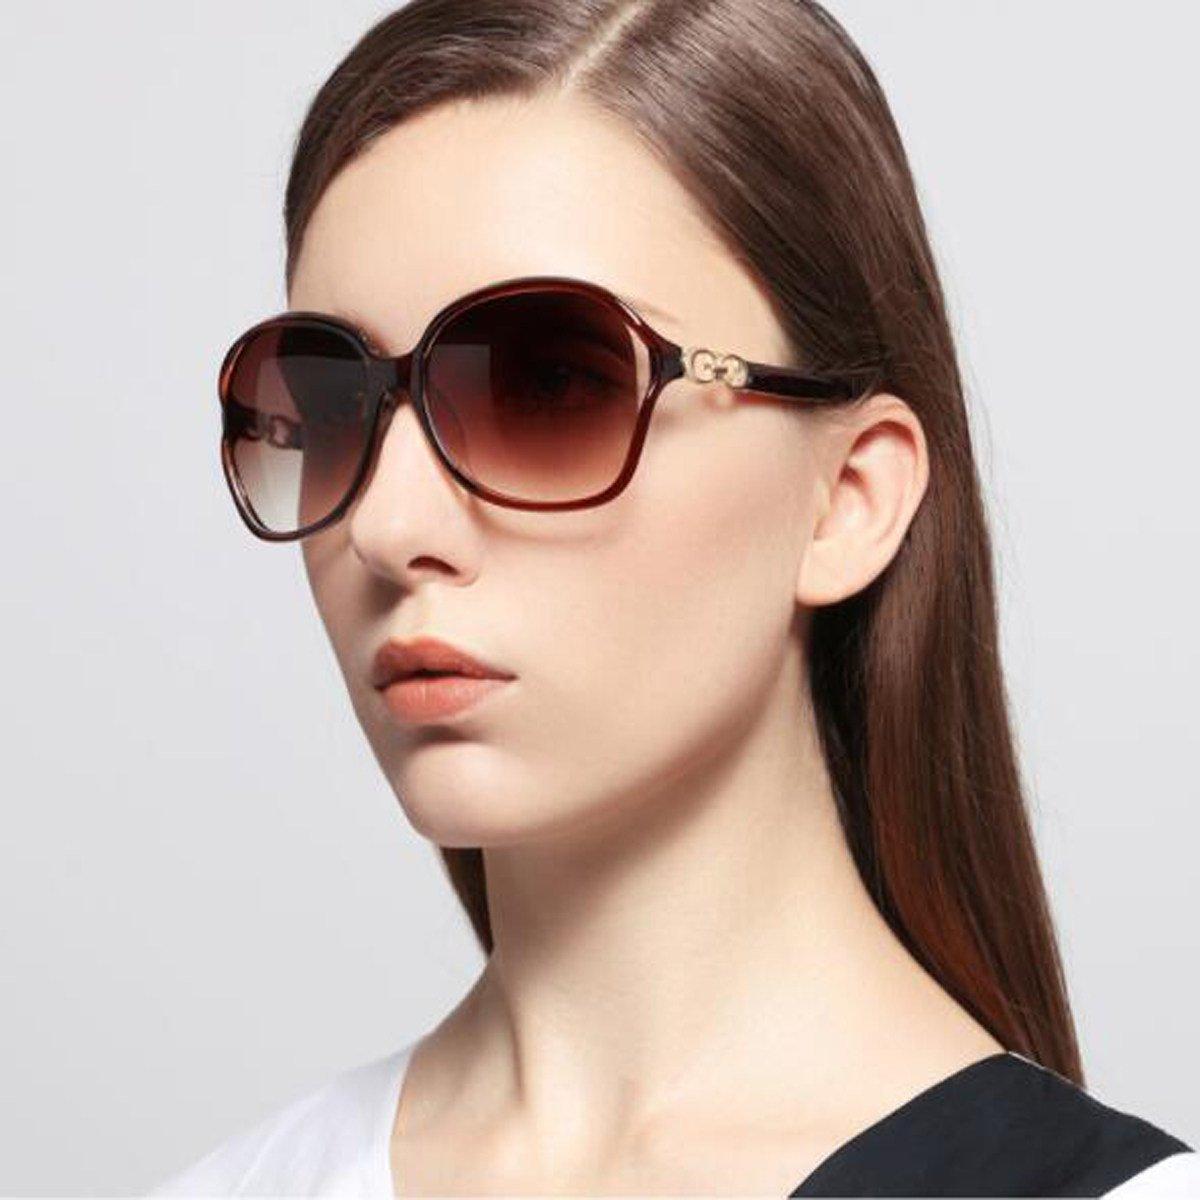 f04a5d4ac4 LQQAZY Gafas De Sol Subtropicales Femeninas Elegantes Hipster Gafas De Sol  Cara Redonda Limpias Elegantes Gafas De Sol,Leopard: Amazon.es: Jardín